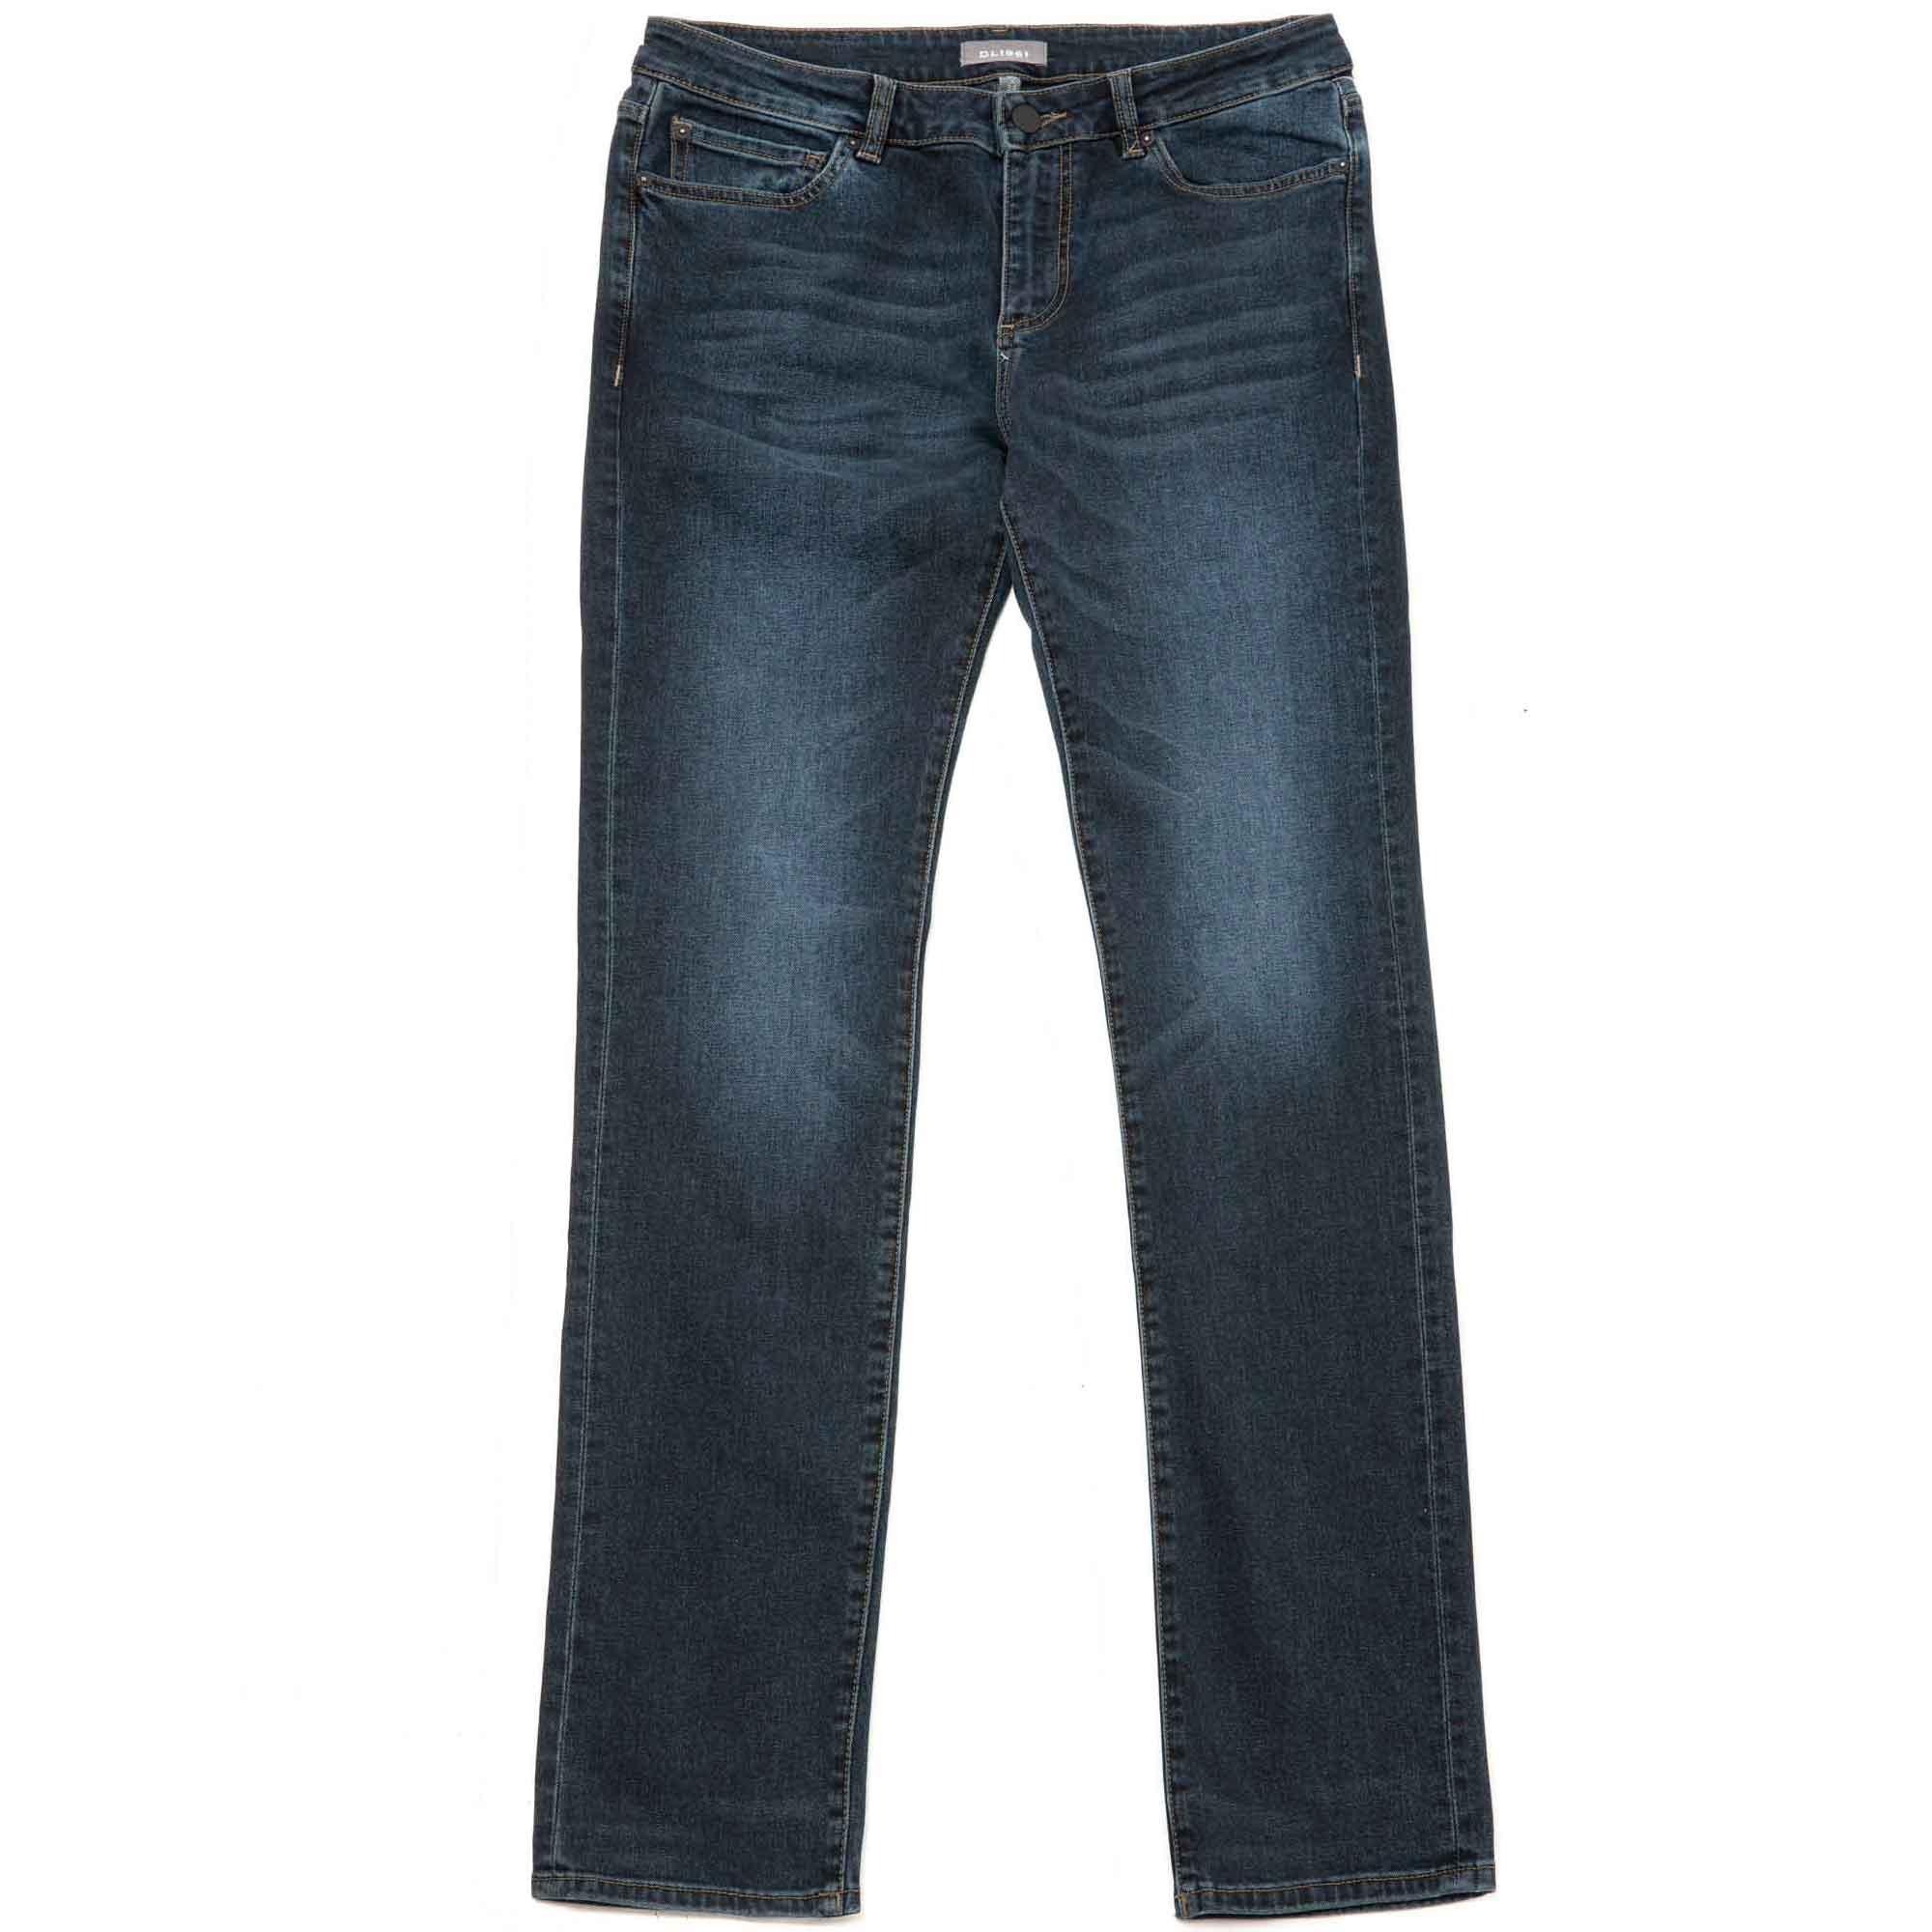 Jeans Nick slim chamber